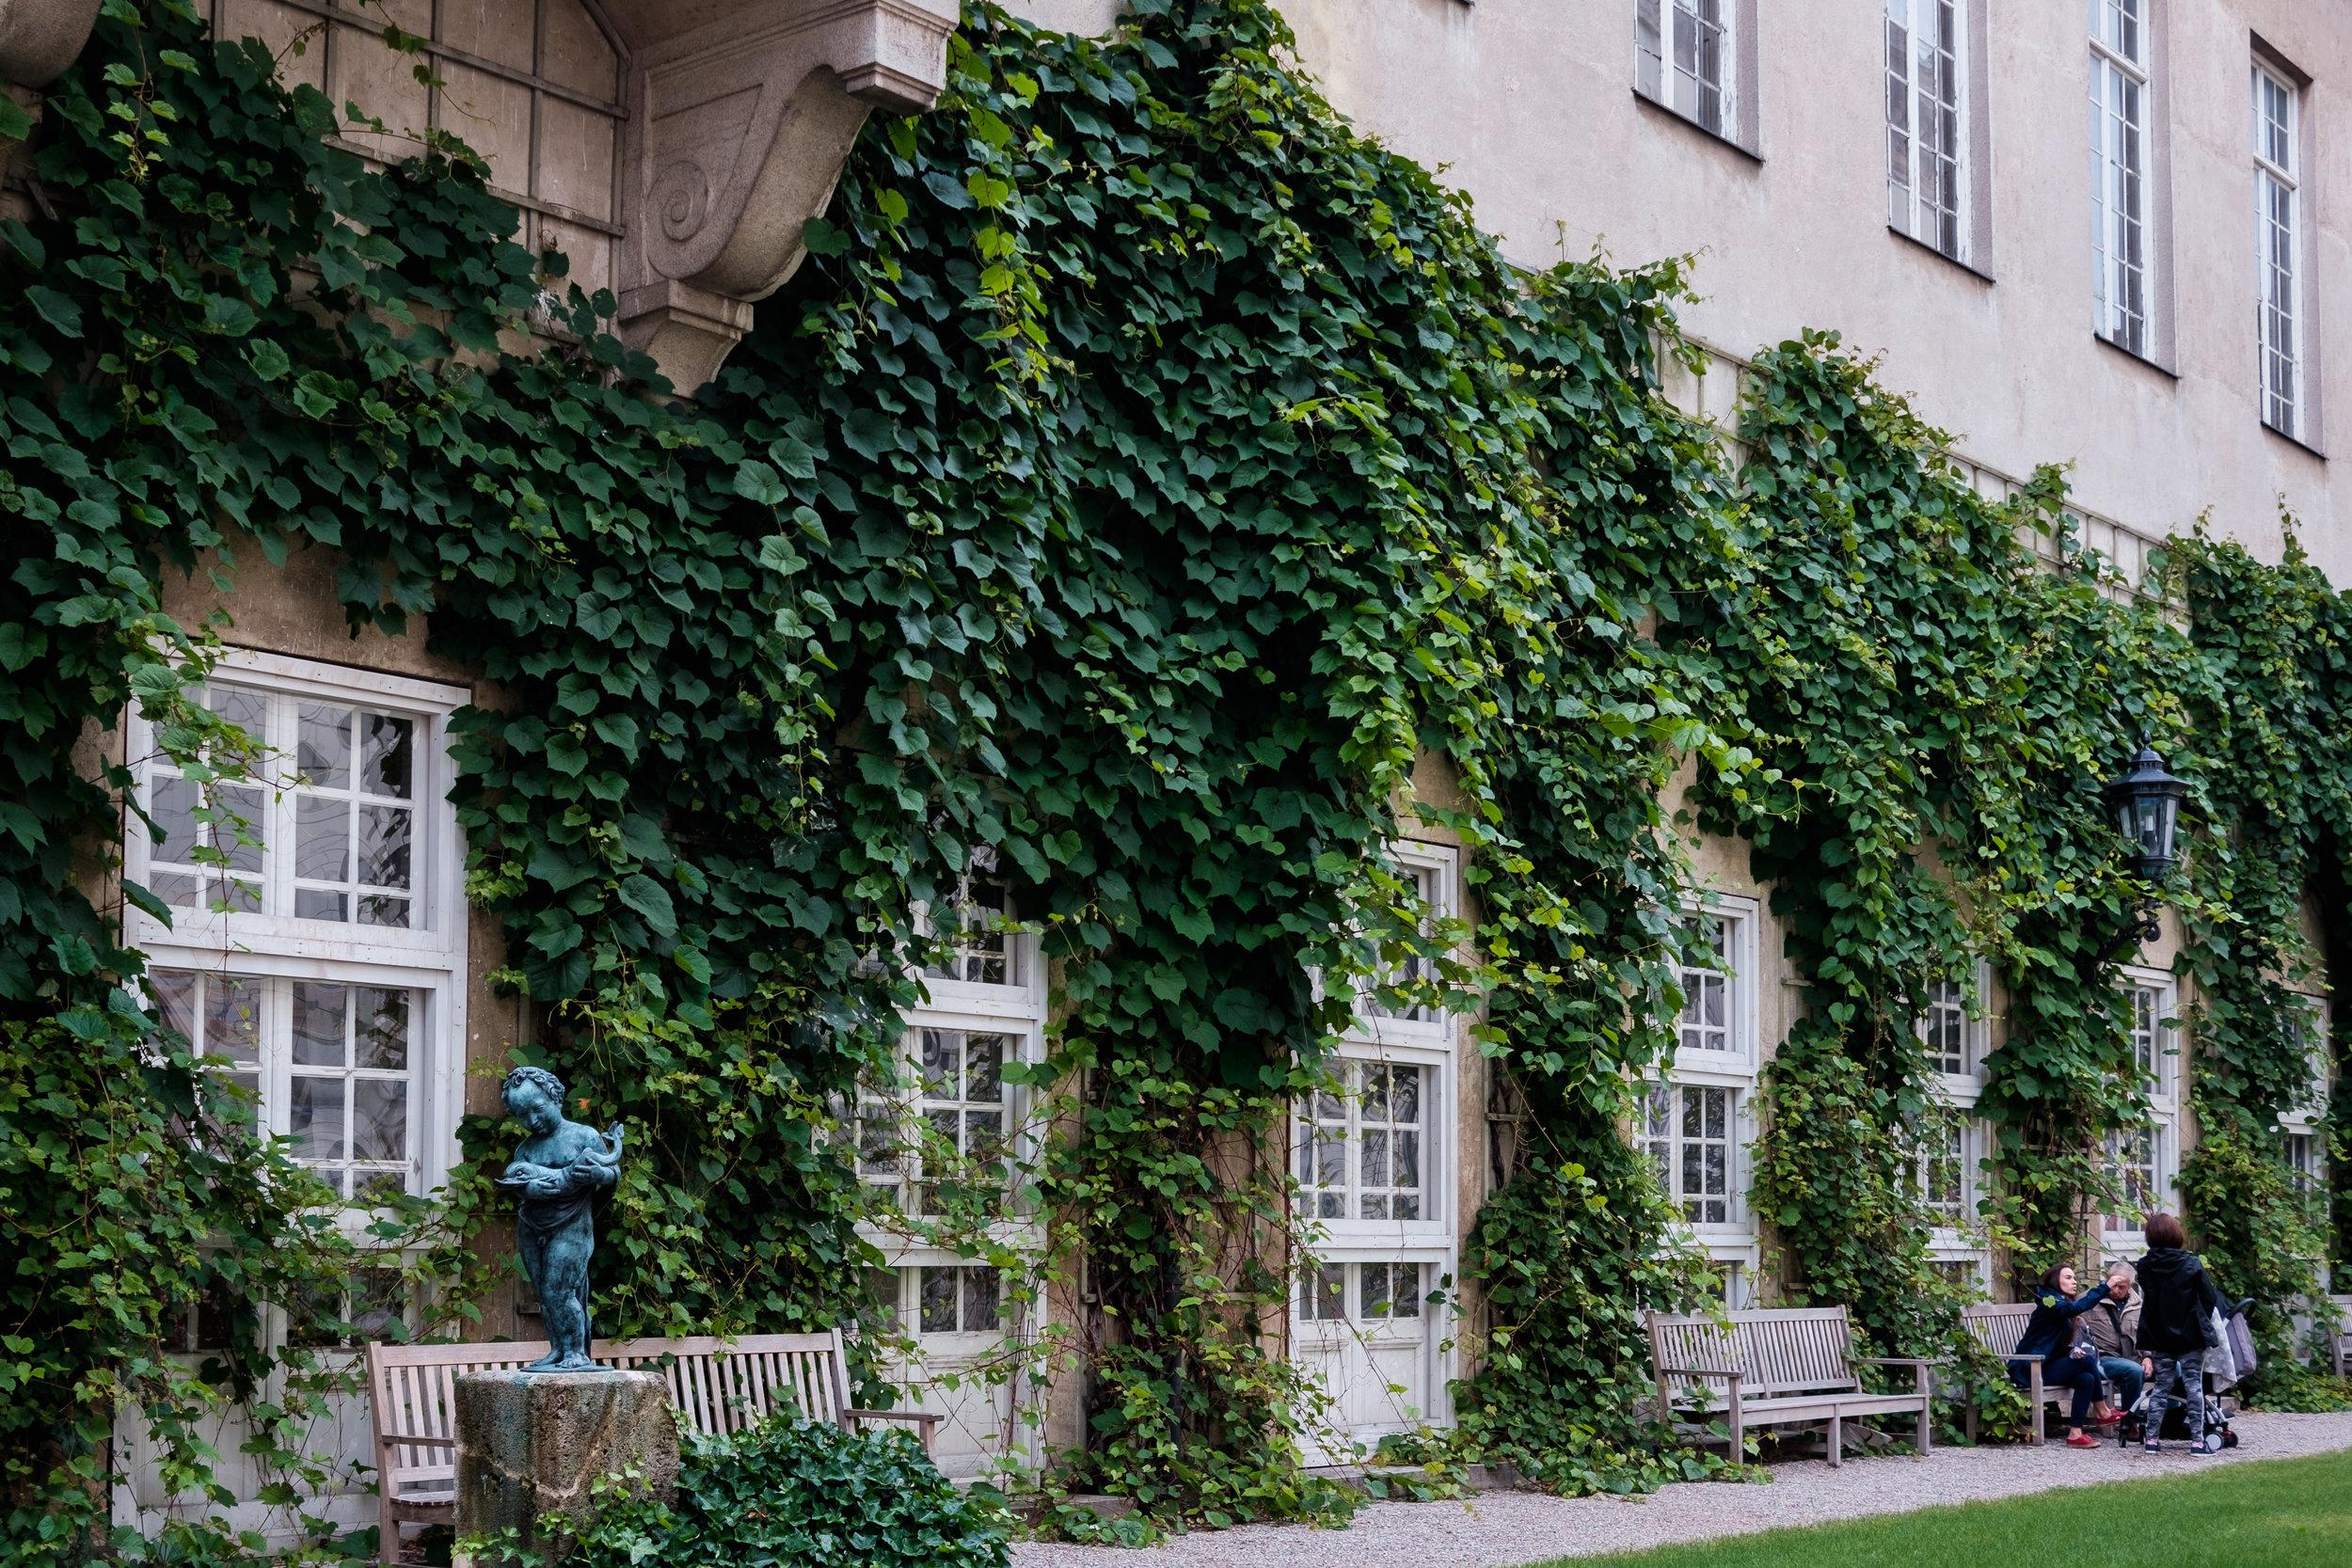 Victoria-Munich-Germany-0110.jpg